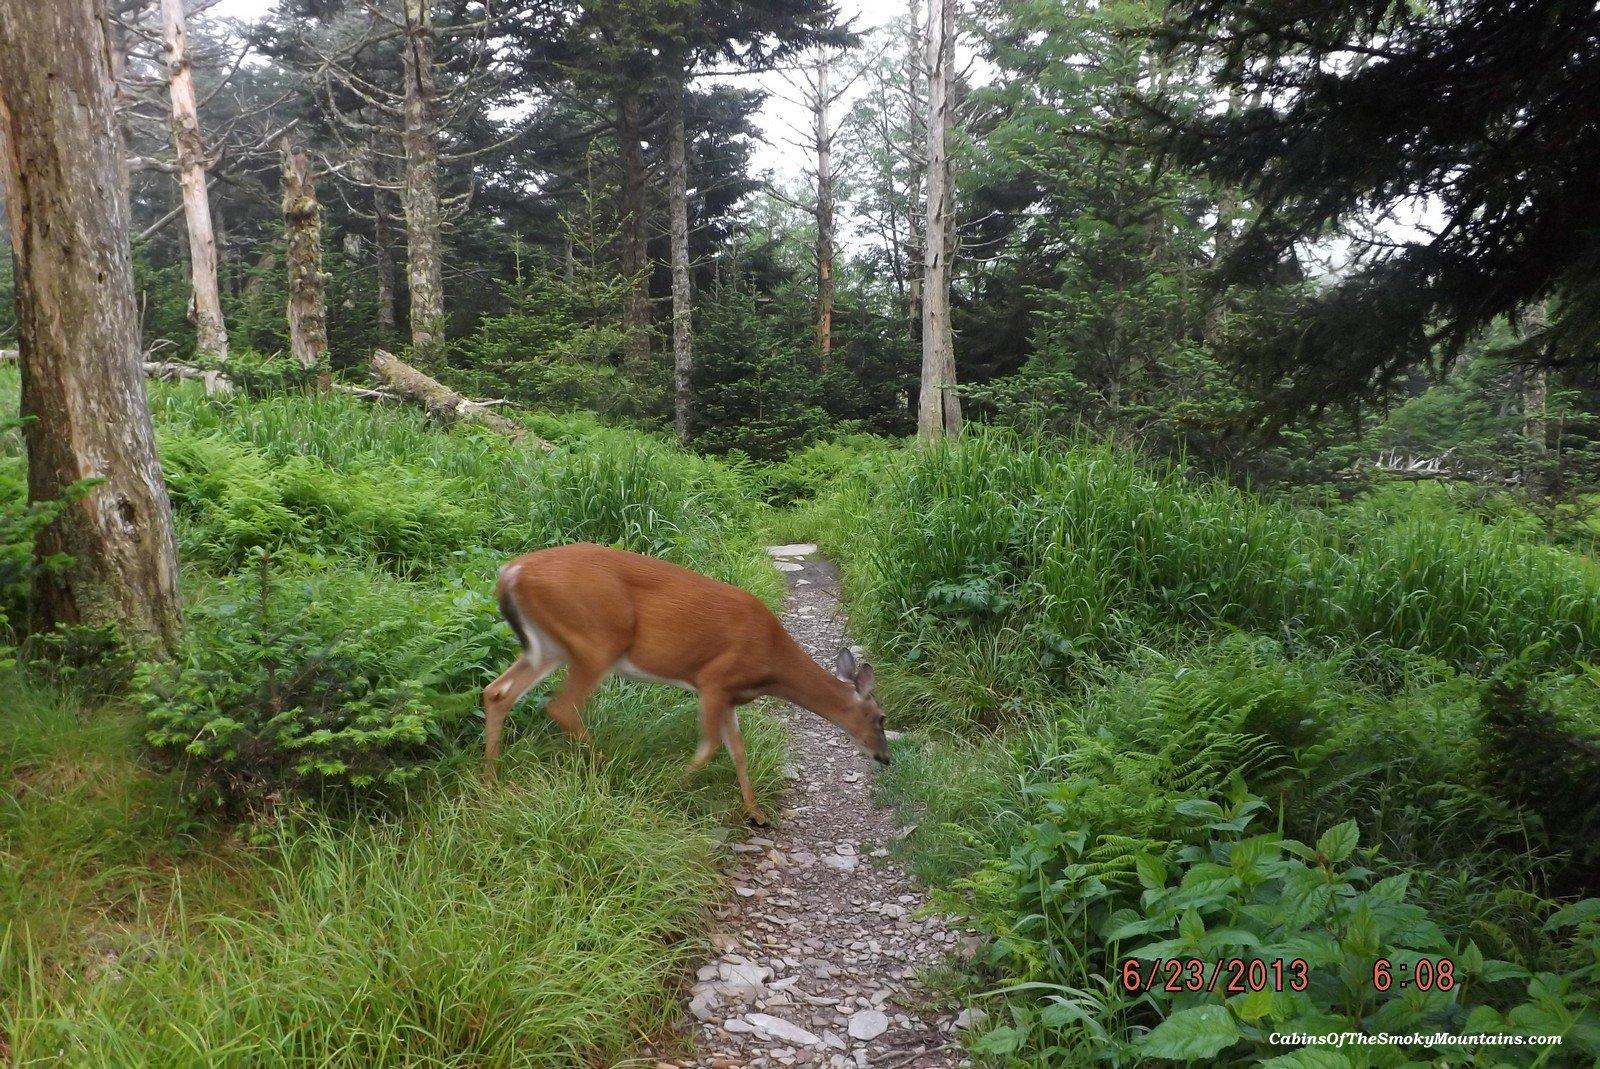 Easy hikes near gatlinburg · 1. Easy Walks In The Smoky Mountains